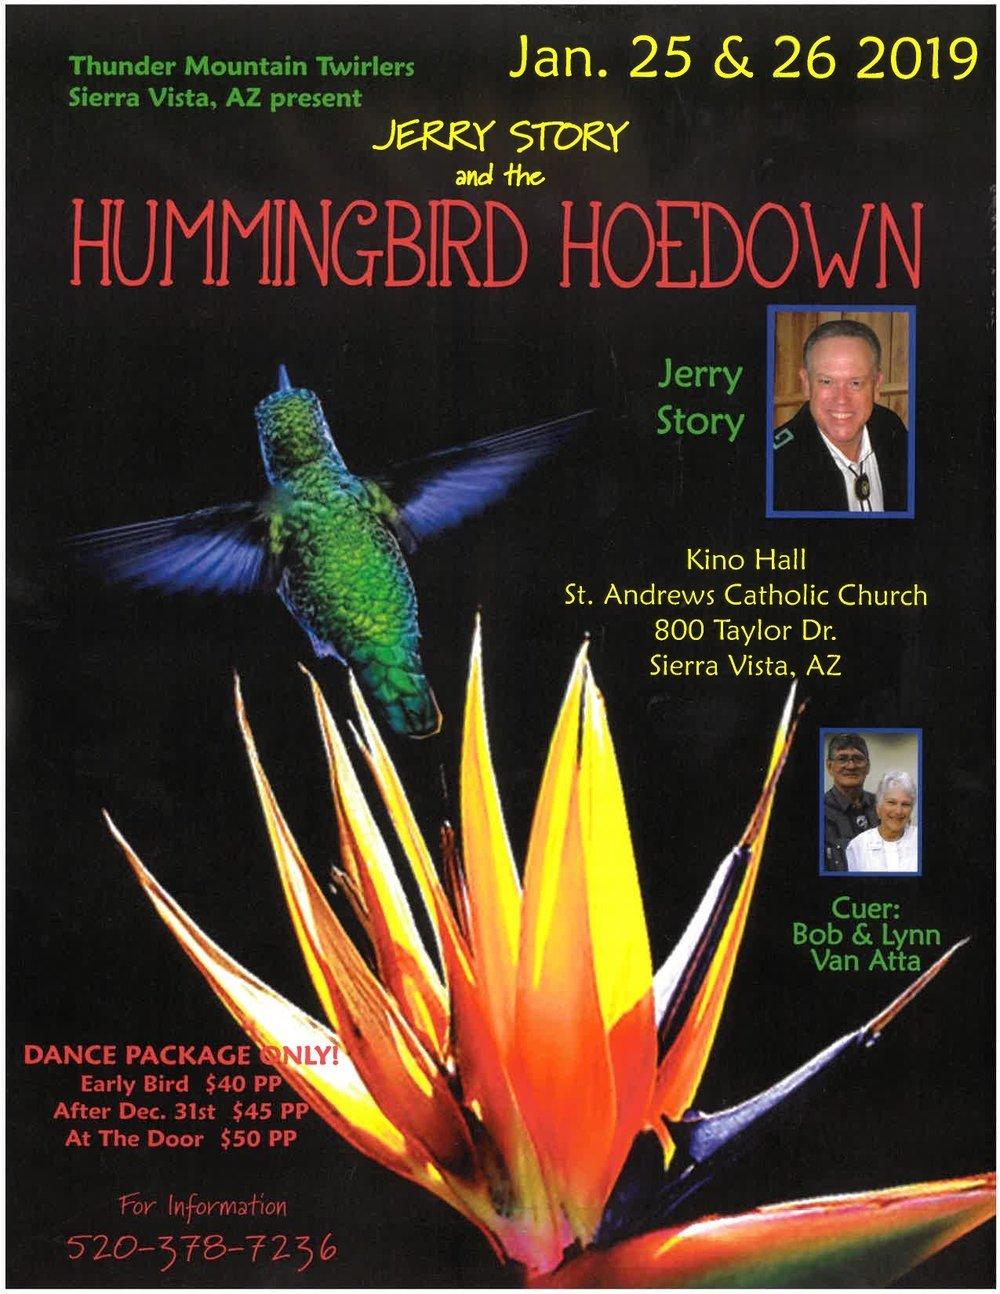 2019 Humminbird Hoedown Flyer.jpg